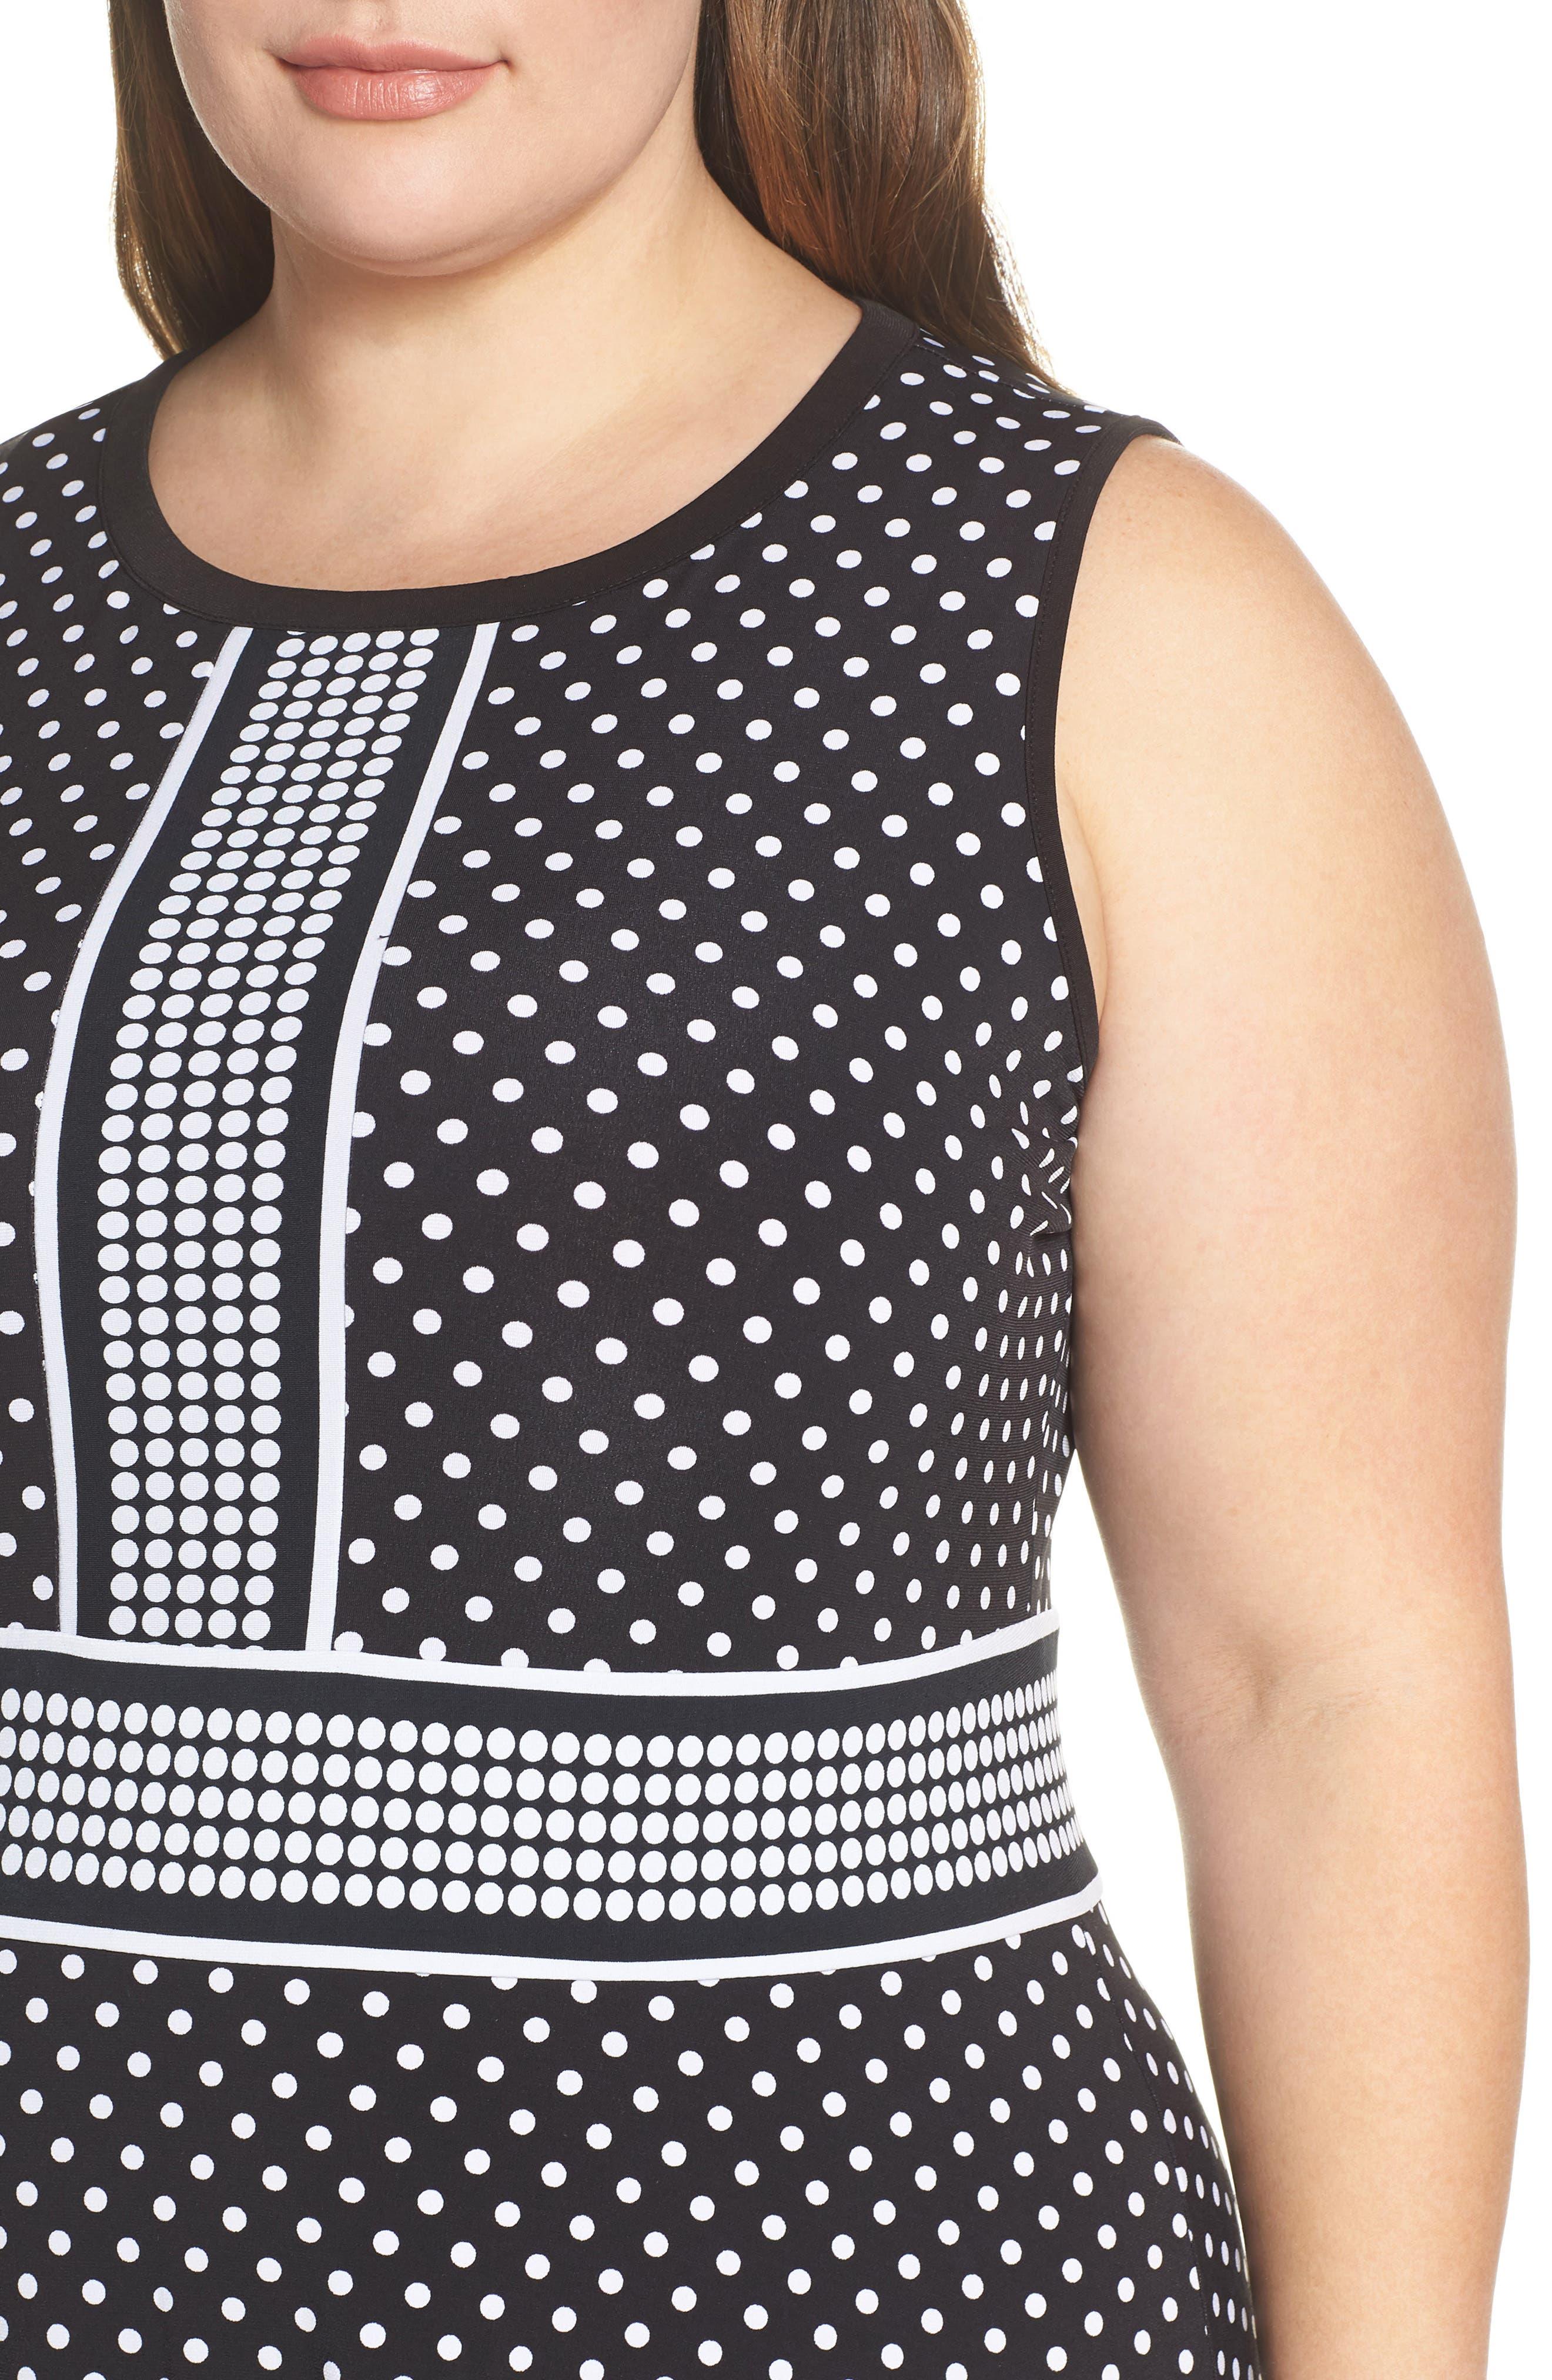 MICHAEL MICHAEL KORS, Mixed Polka Dot Dress, Alternate thumbnail 5, color, BLACK/ WHITE